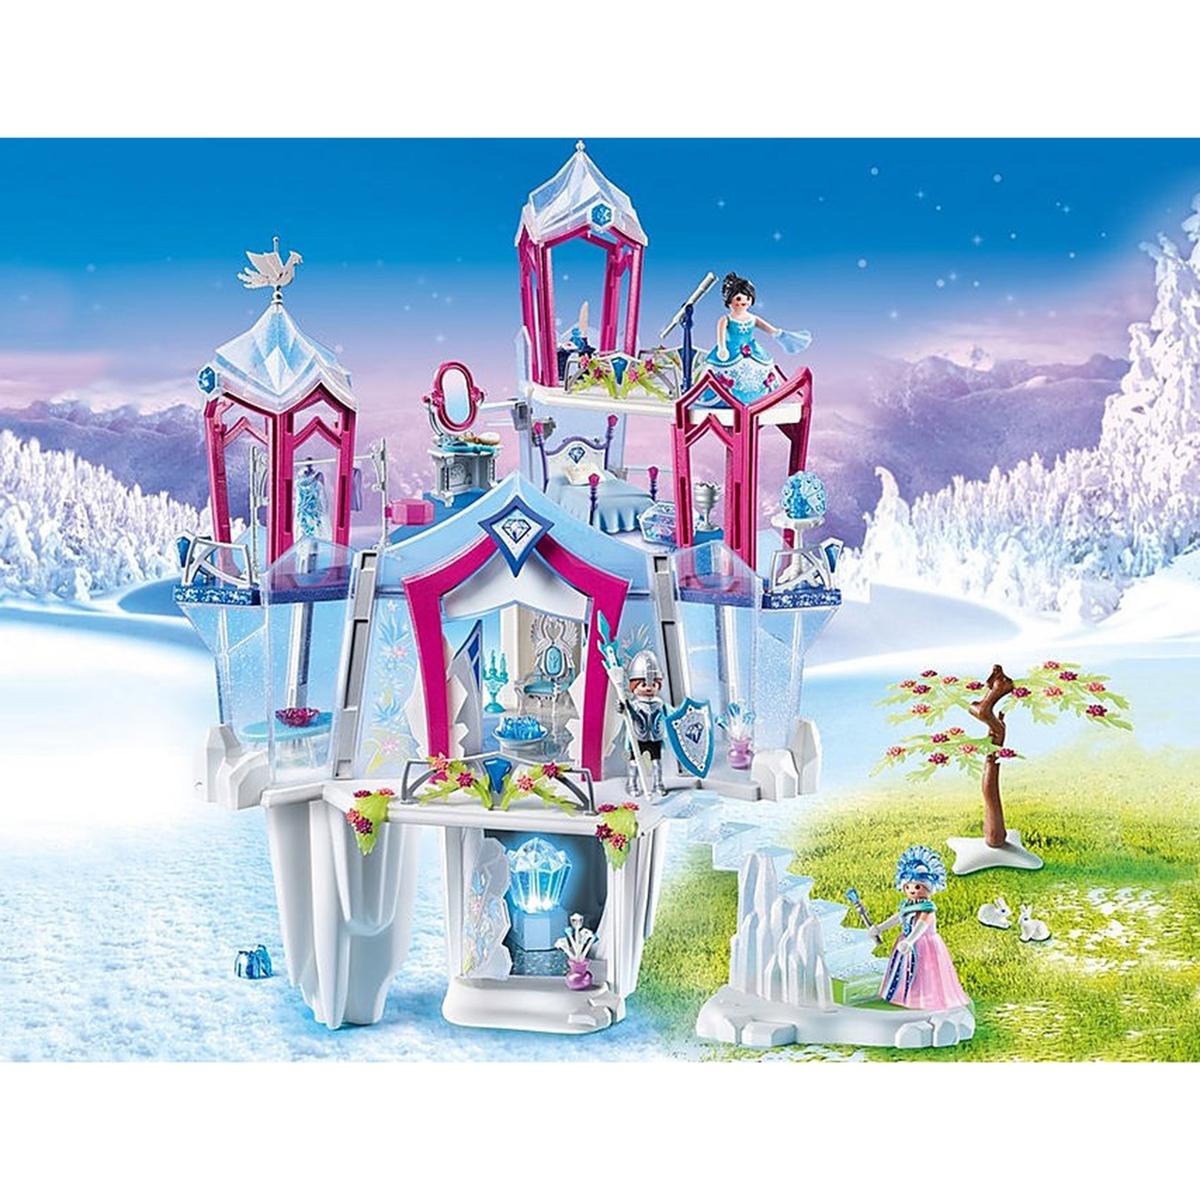 An image of Playmobil Crystal Palace